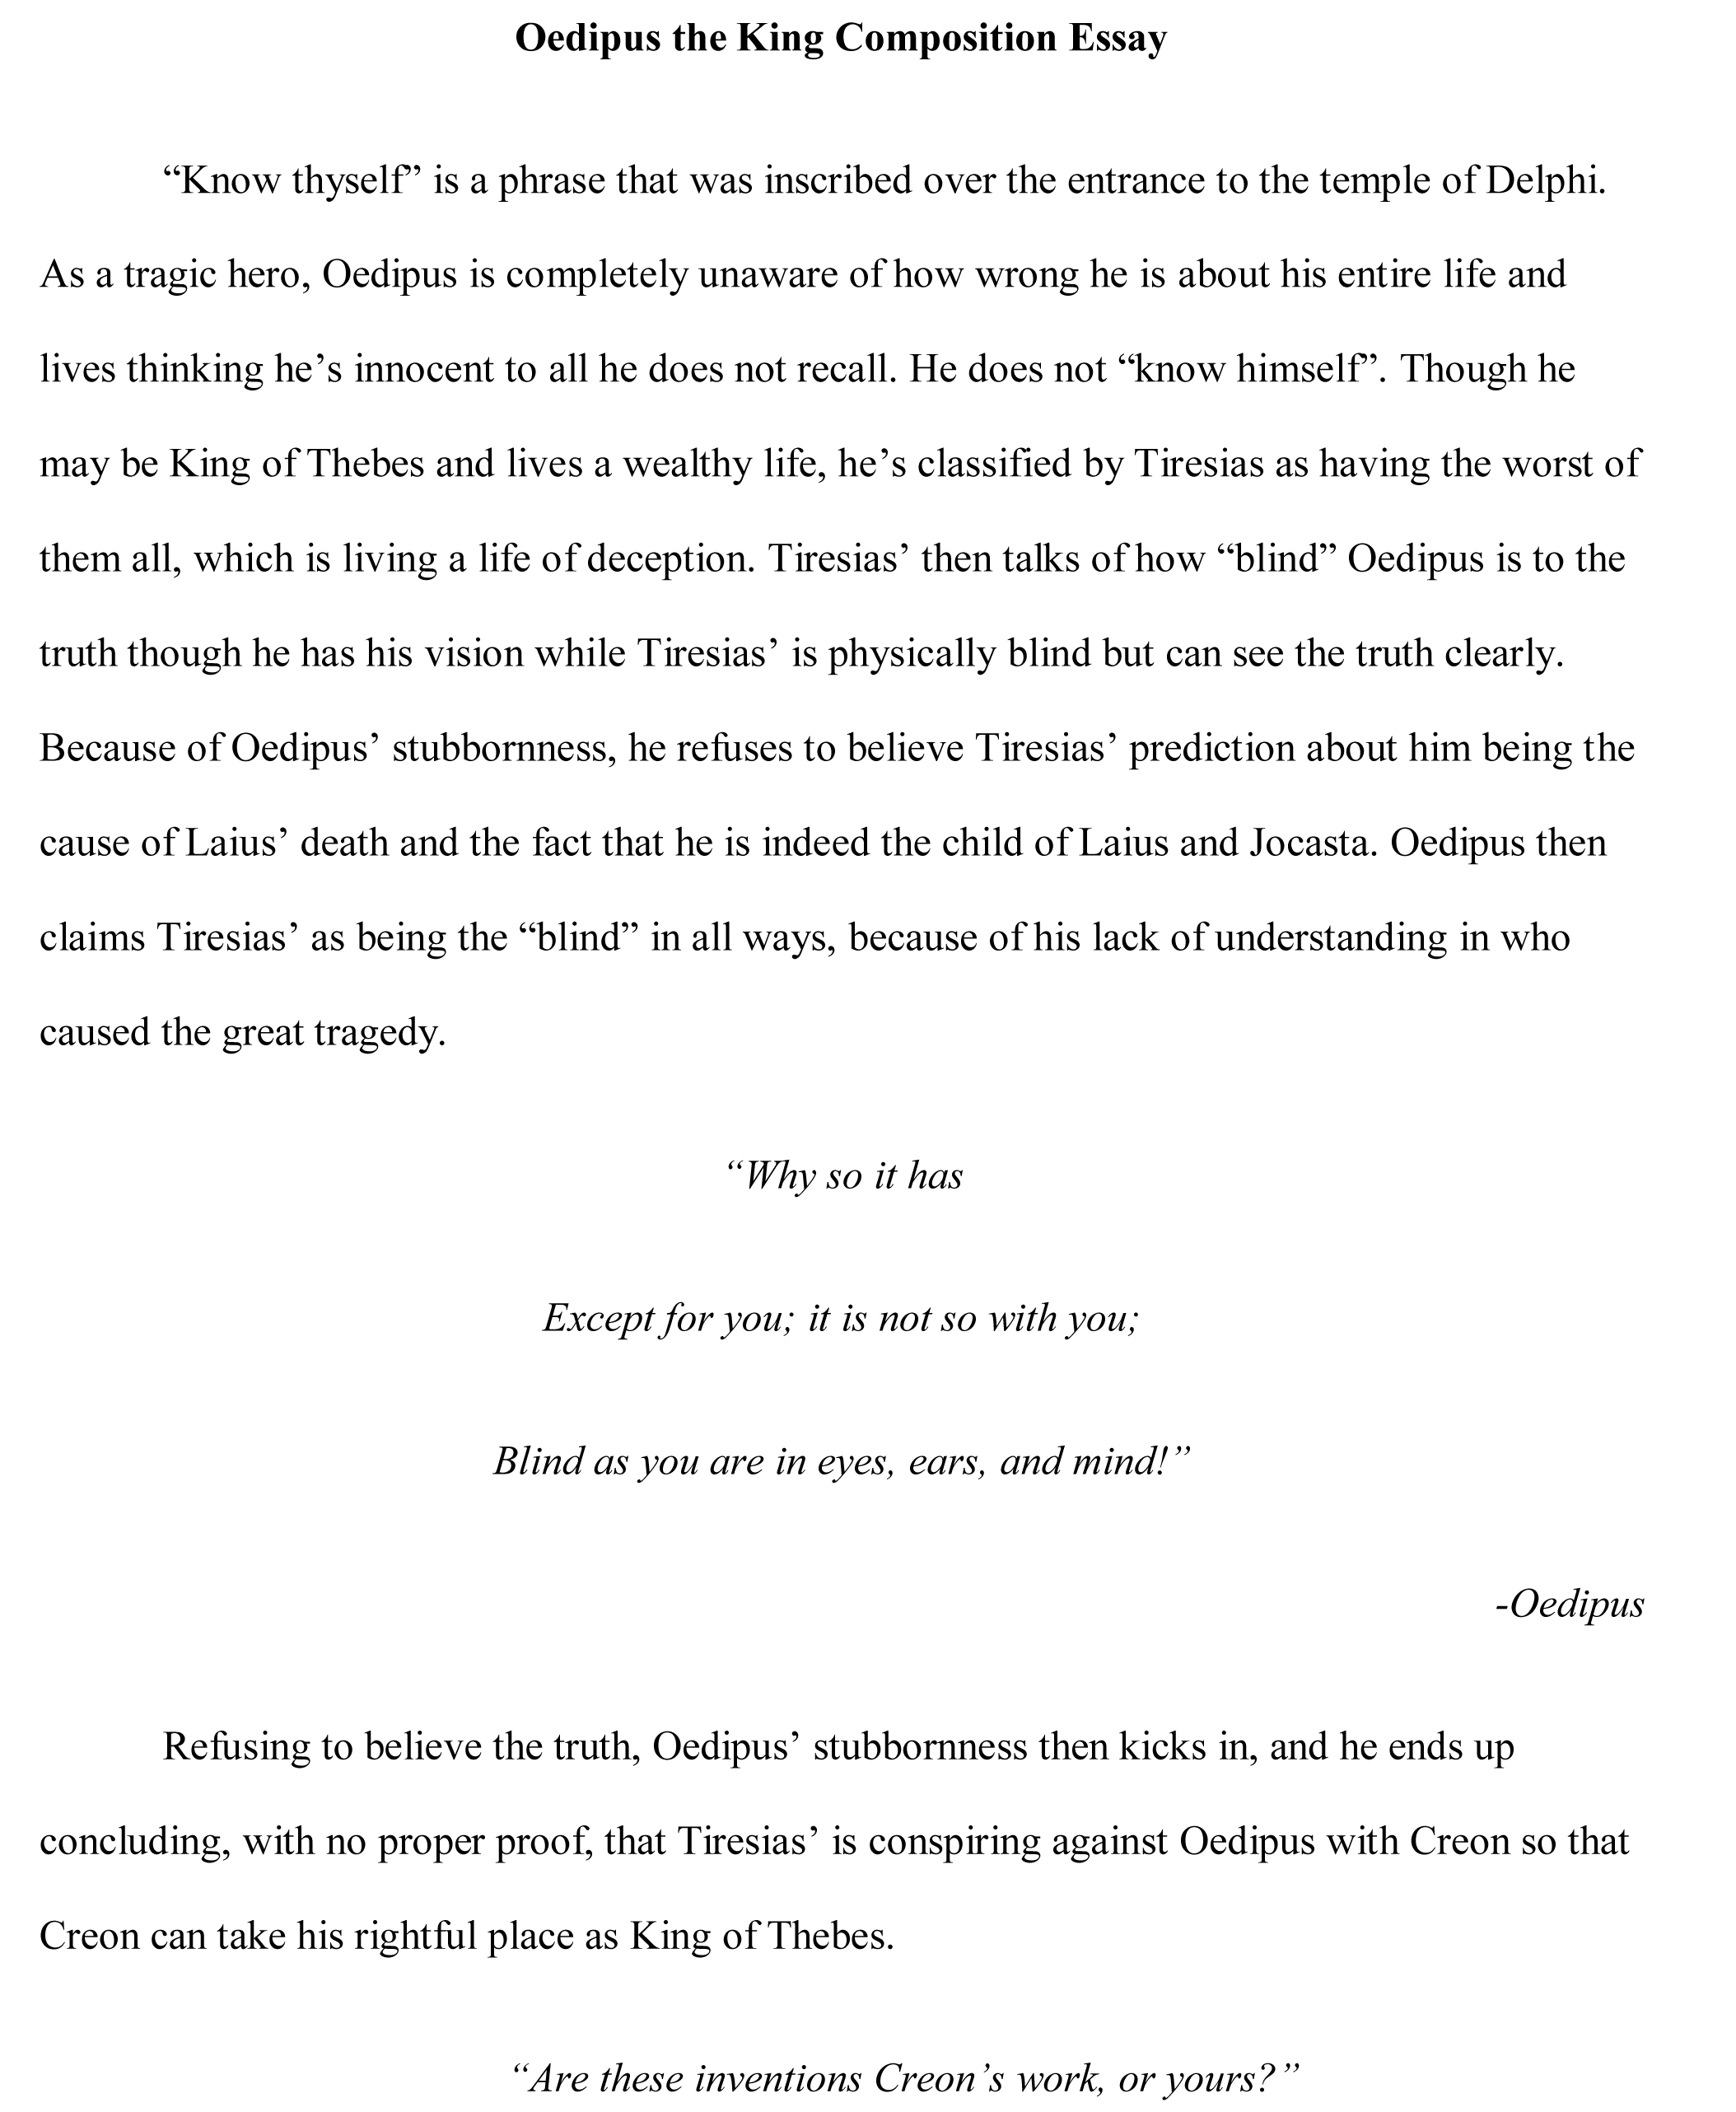 005 Oedipus Essay Free Sample Good Topics To Write An On Marvelous Easy Persuasive Essays Opinion Full